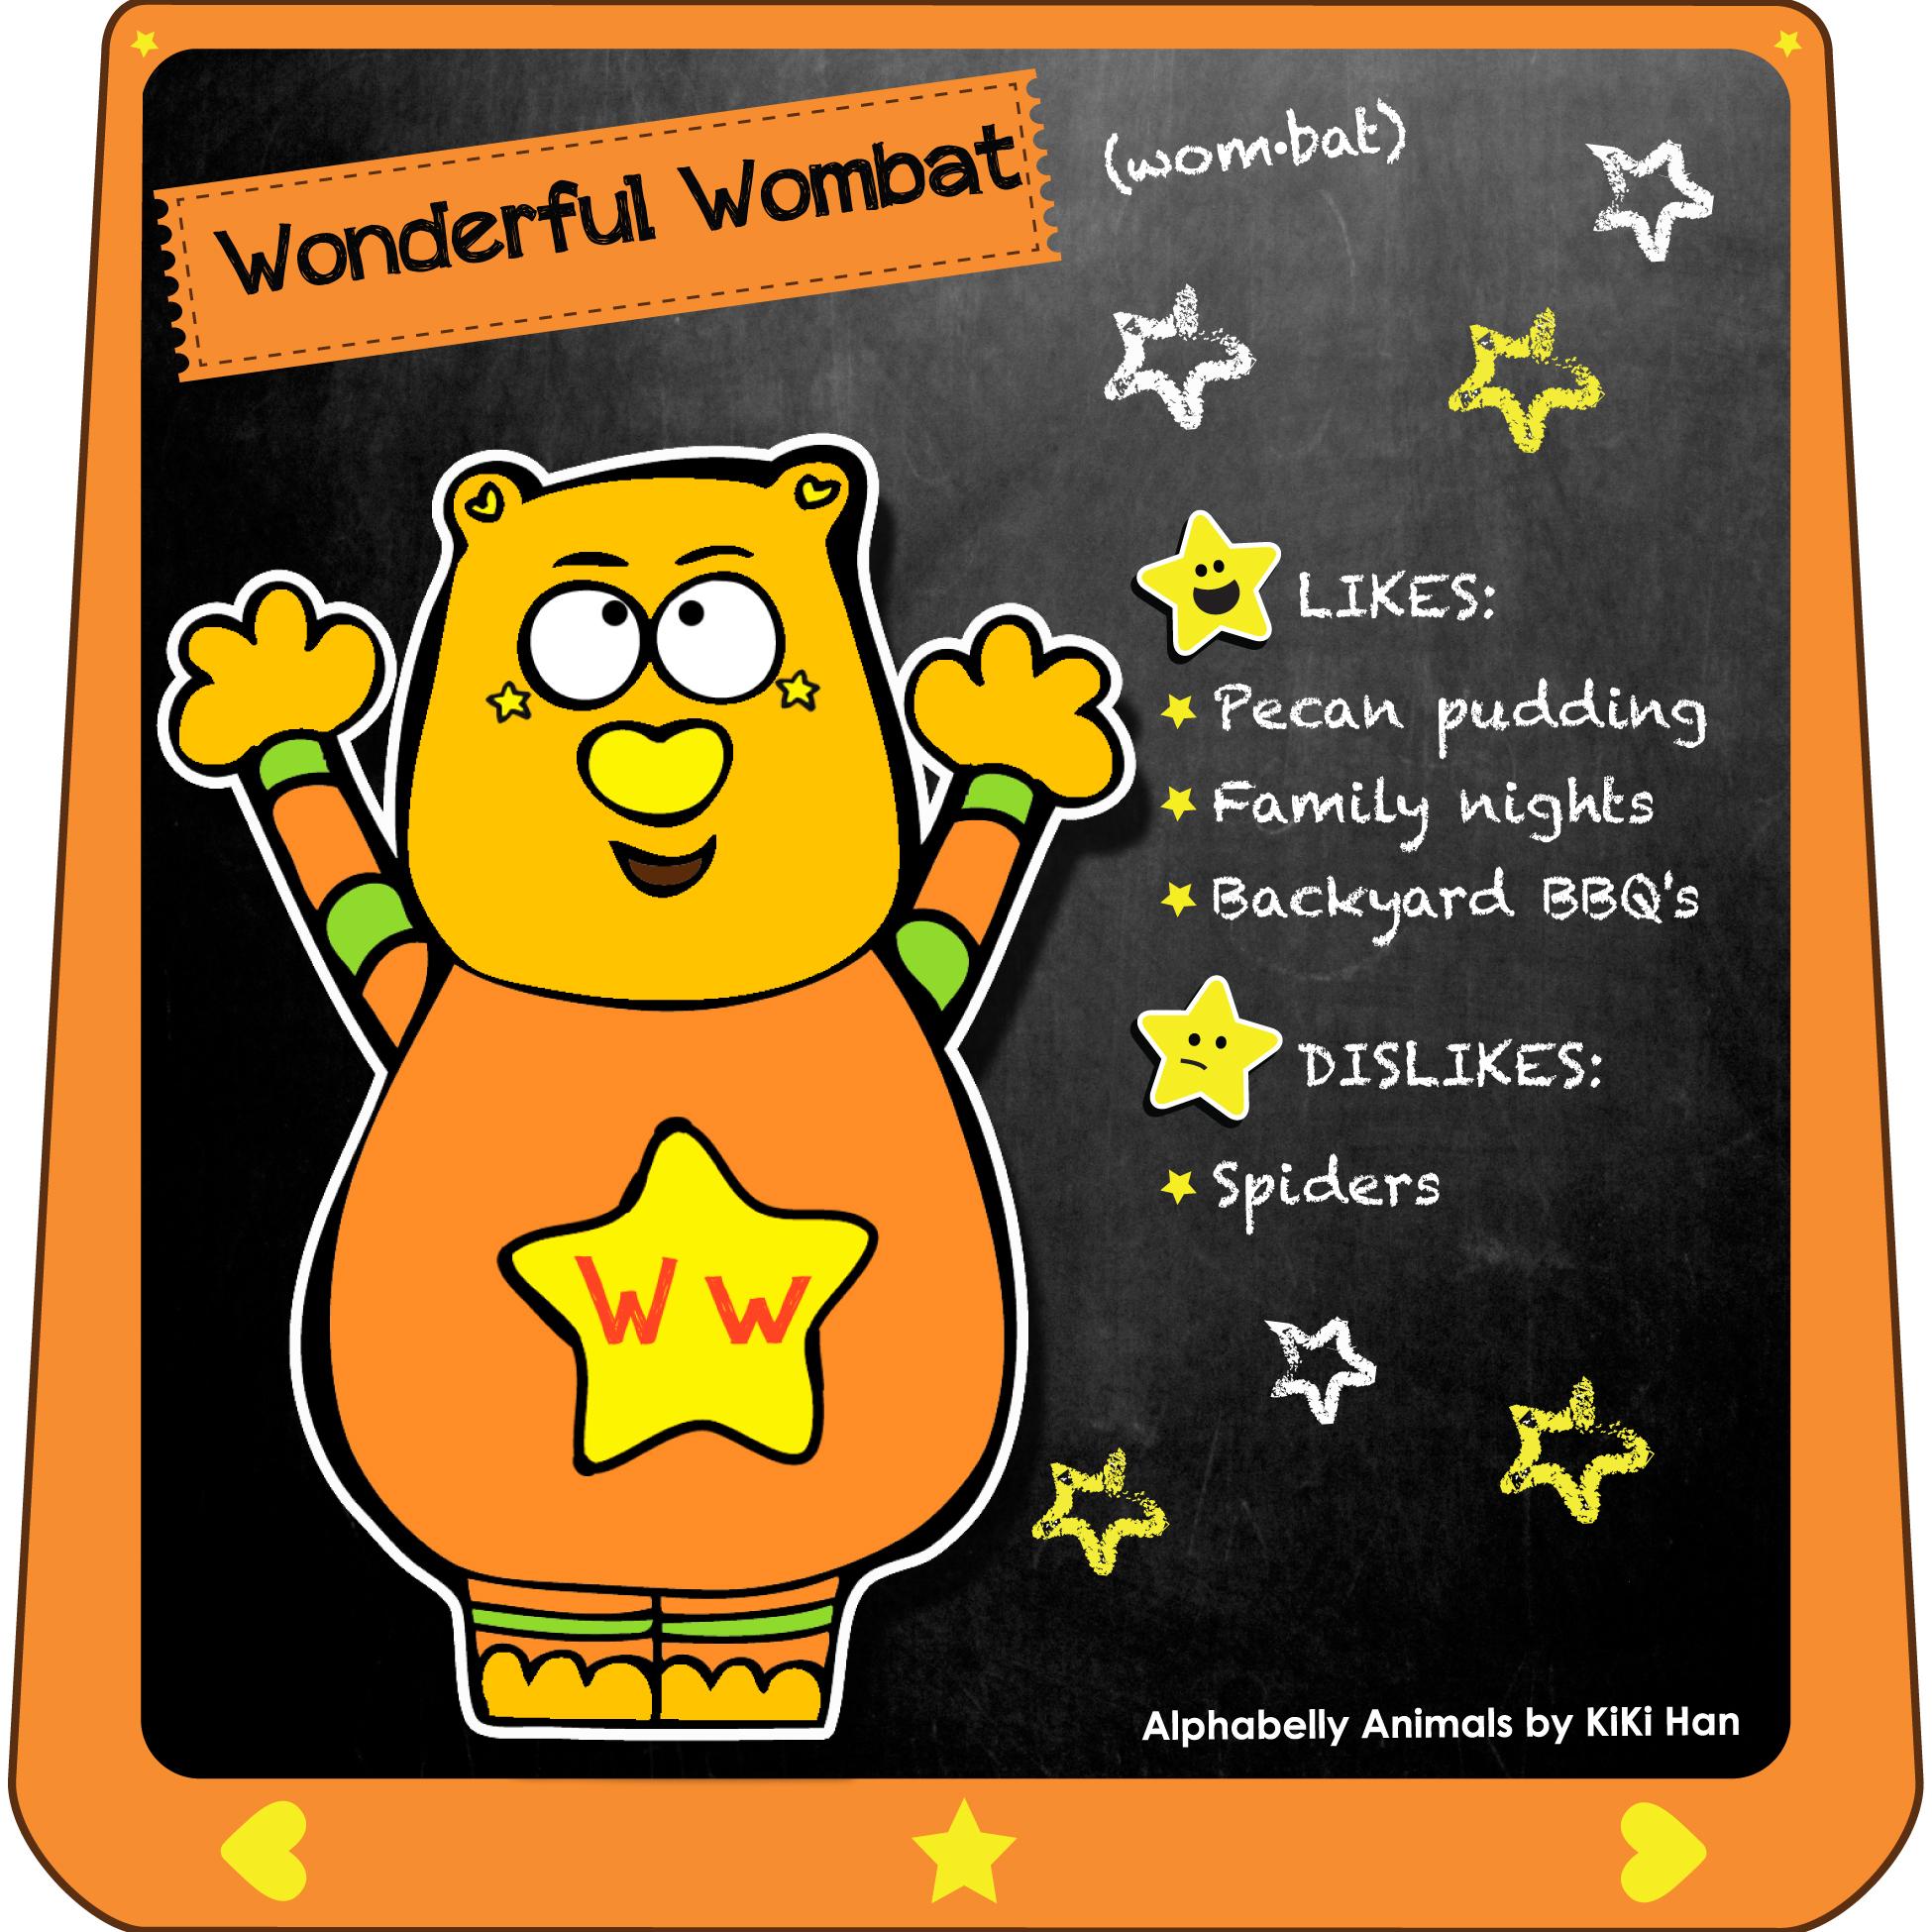 Wombat I KiKi Han I KiKiHan I GeekyKiKi I Geeky KiKi I Missgeekykiki I Cutiecons I Cutiecon I Cutie Con I Alphabellies I Alphabelly I A to Z Animal Poster